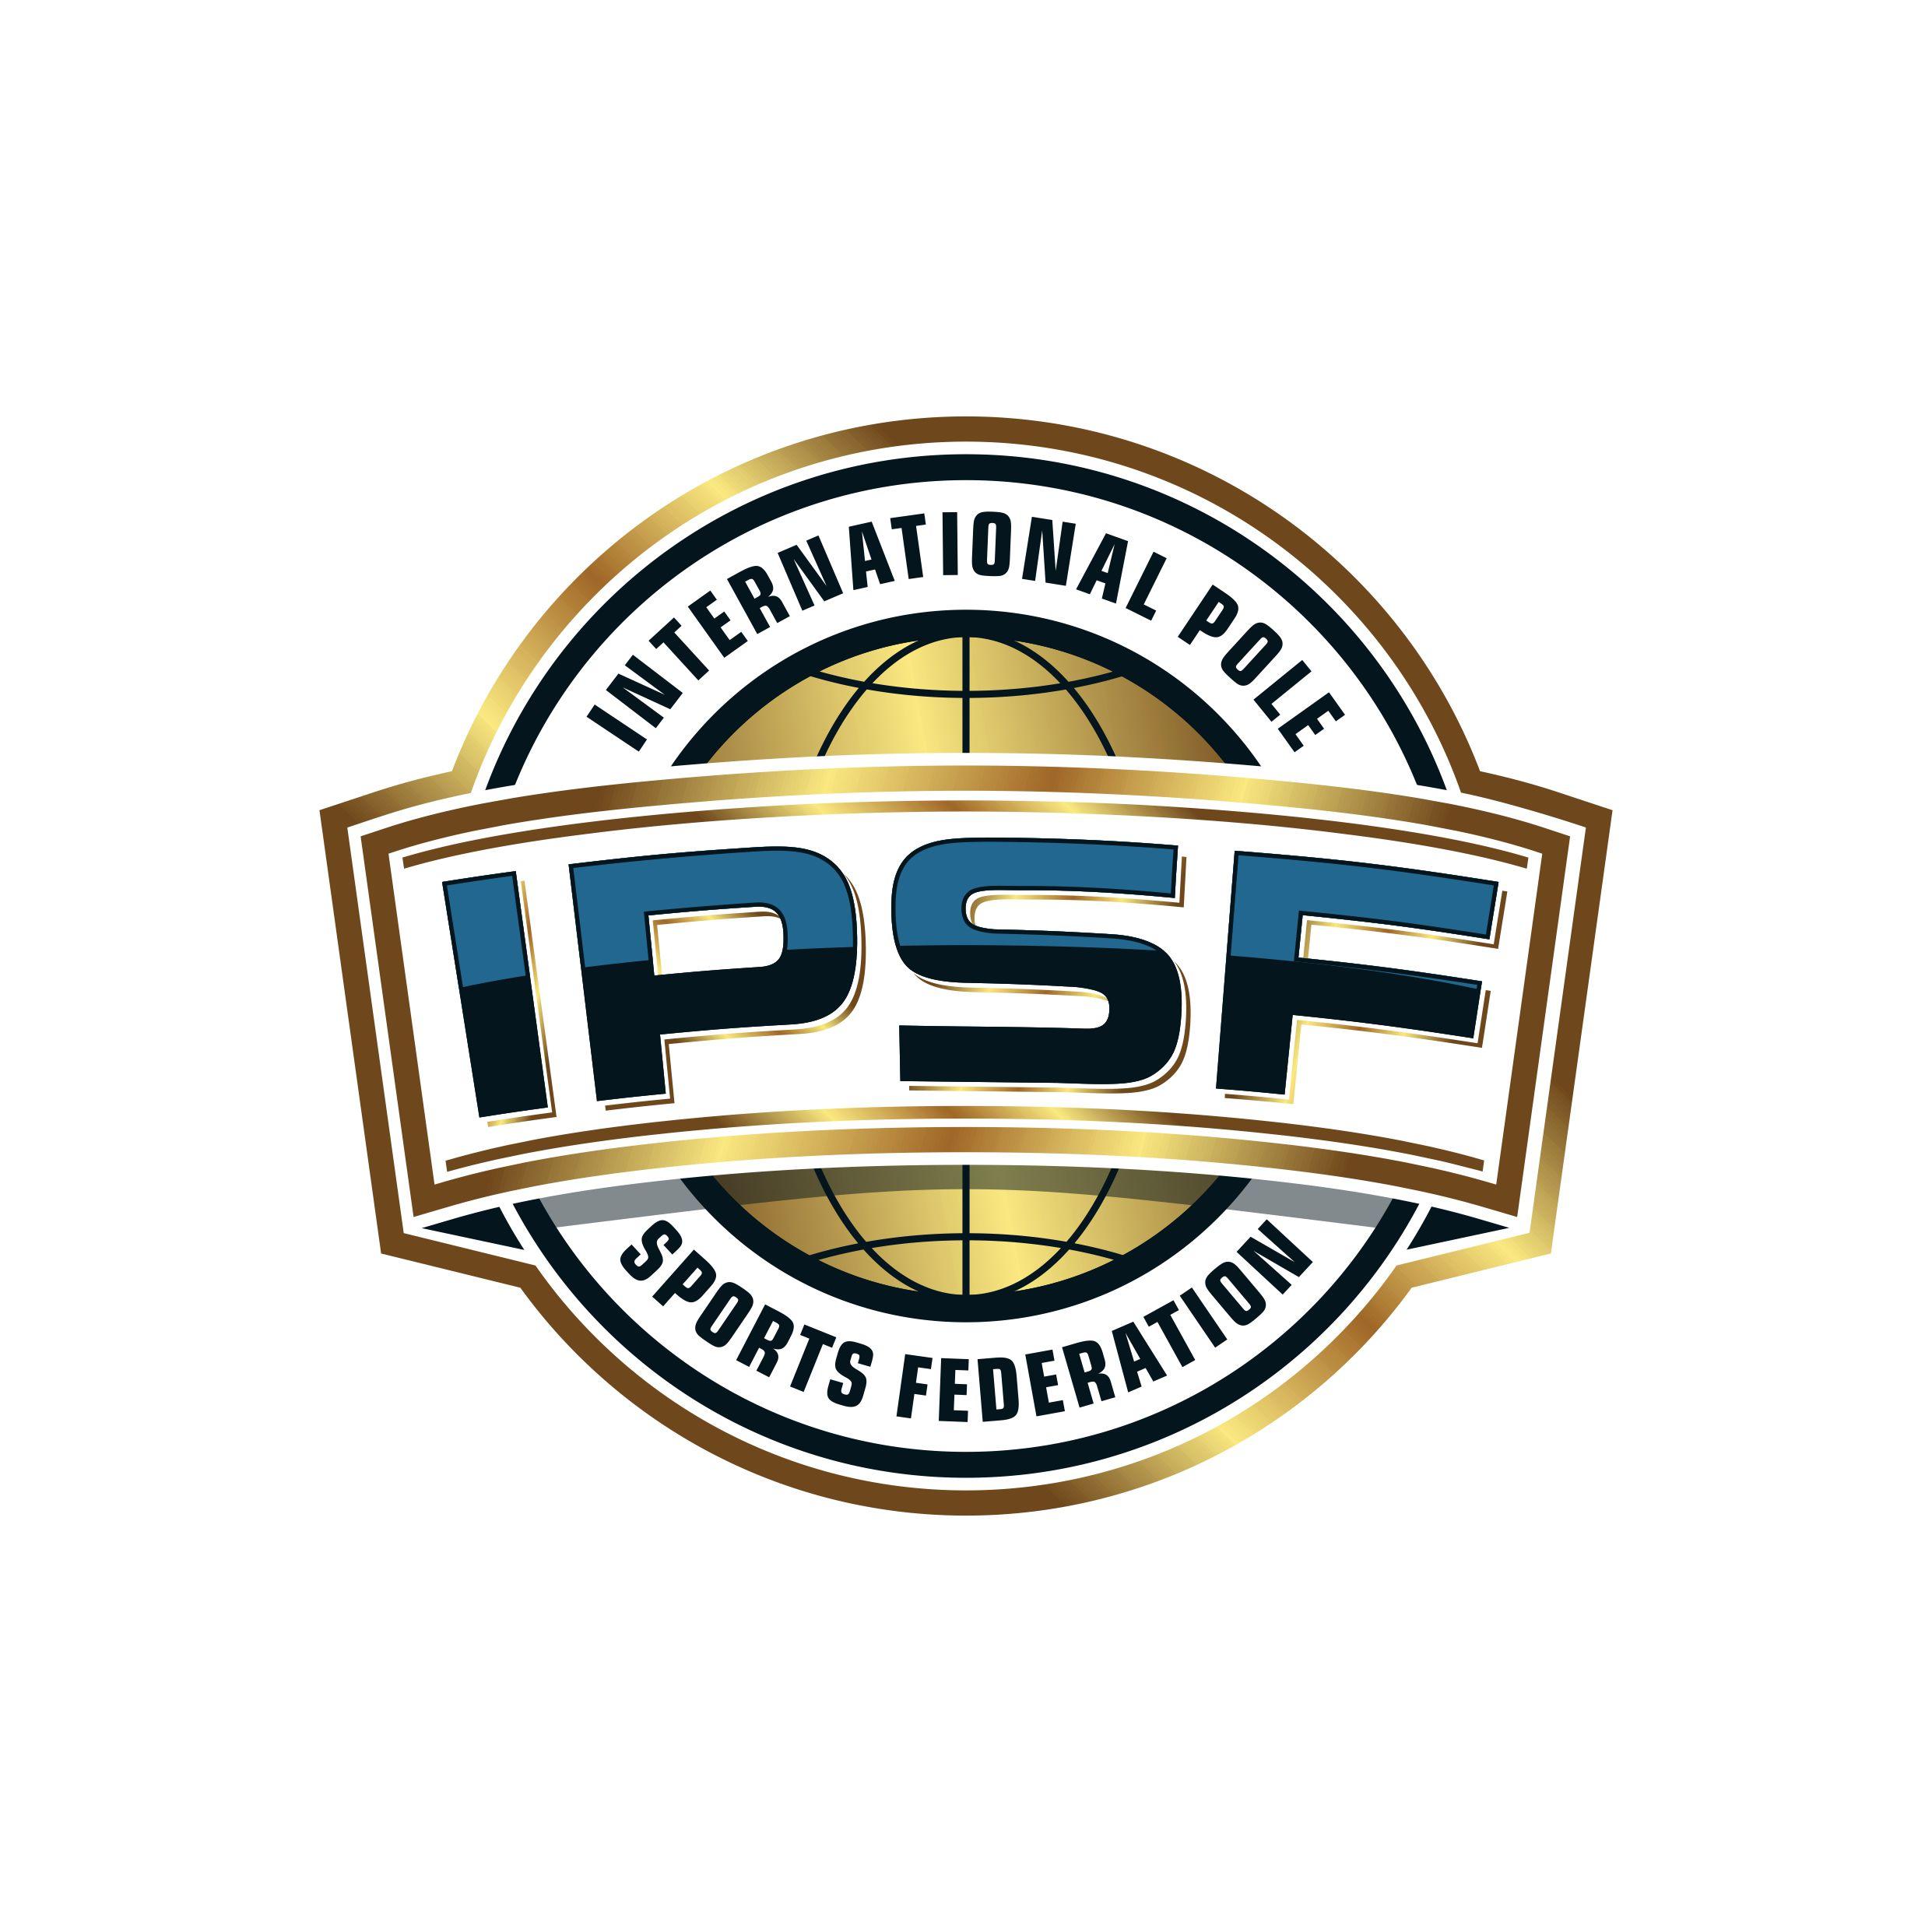 International Pole Sports Federation (IPSF)